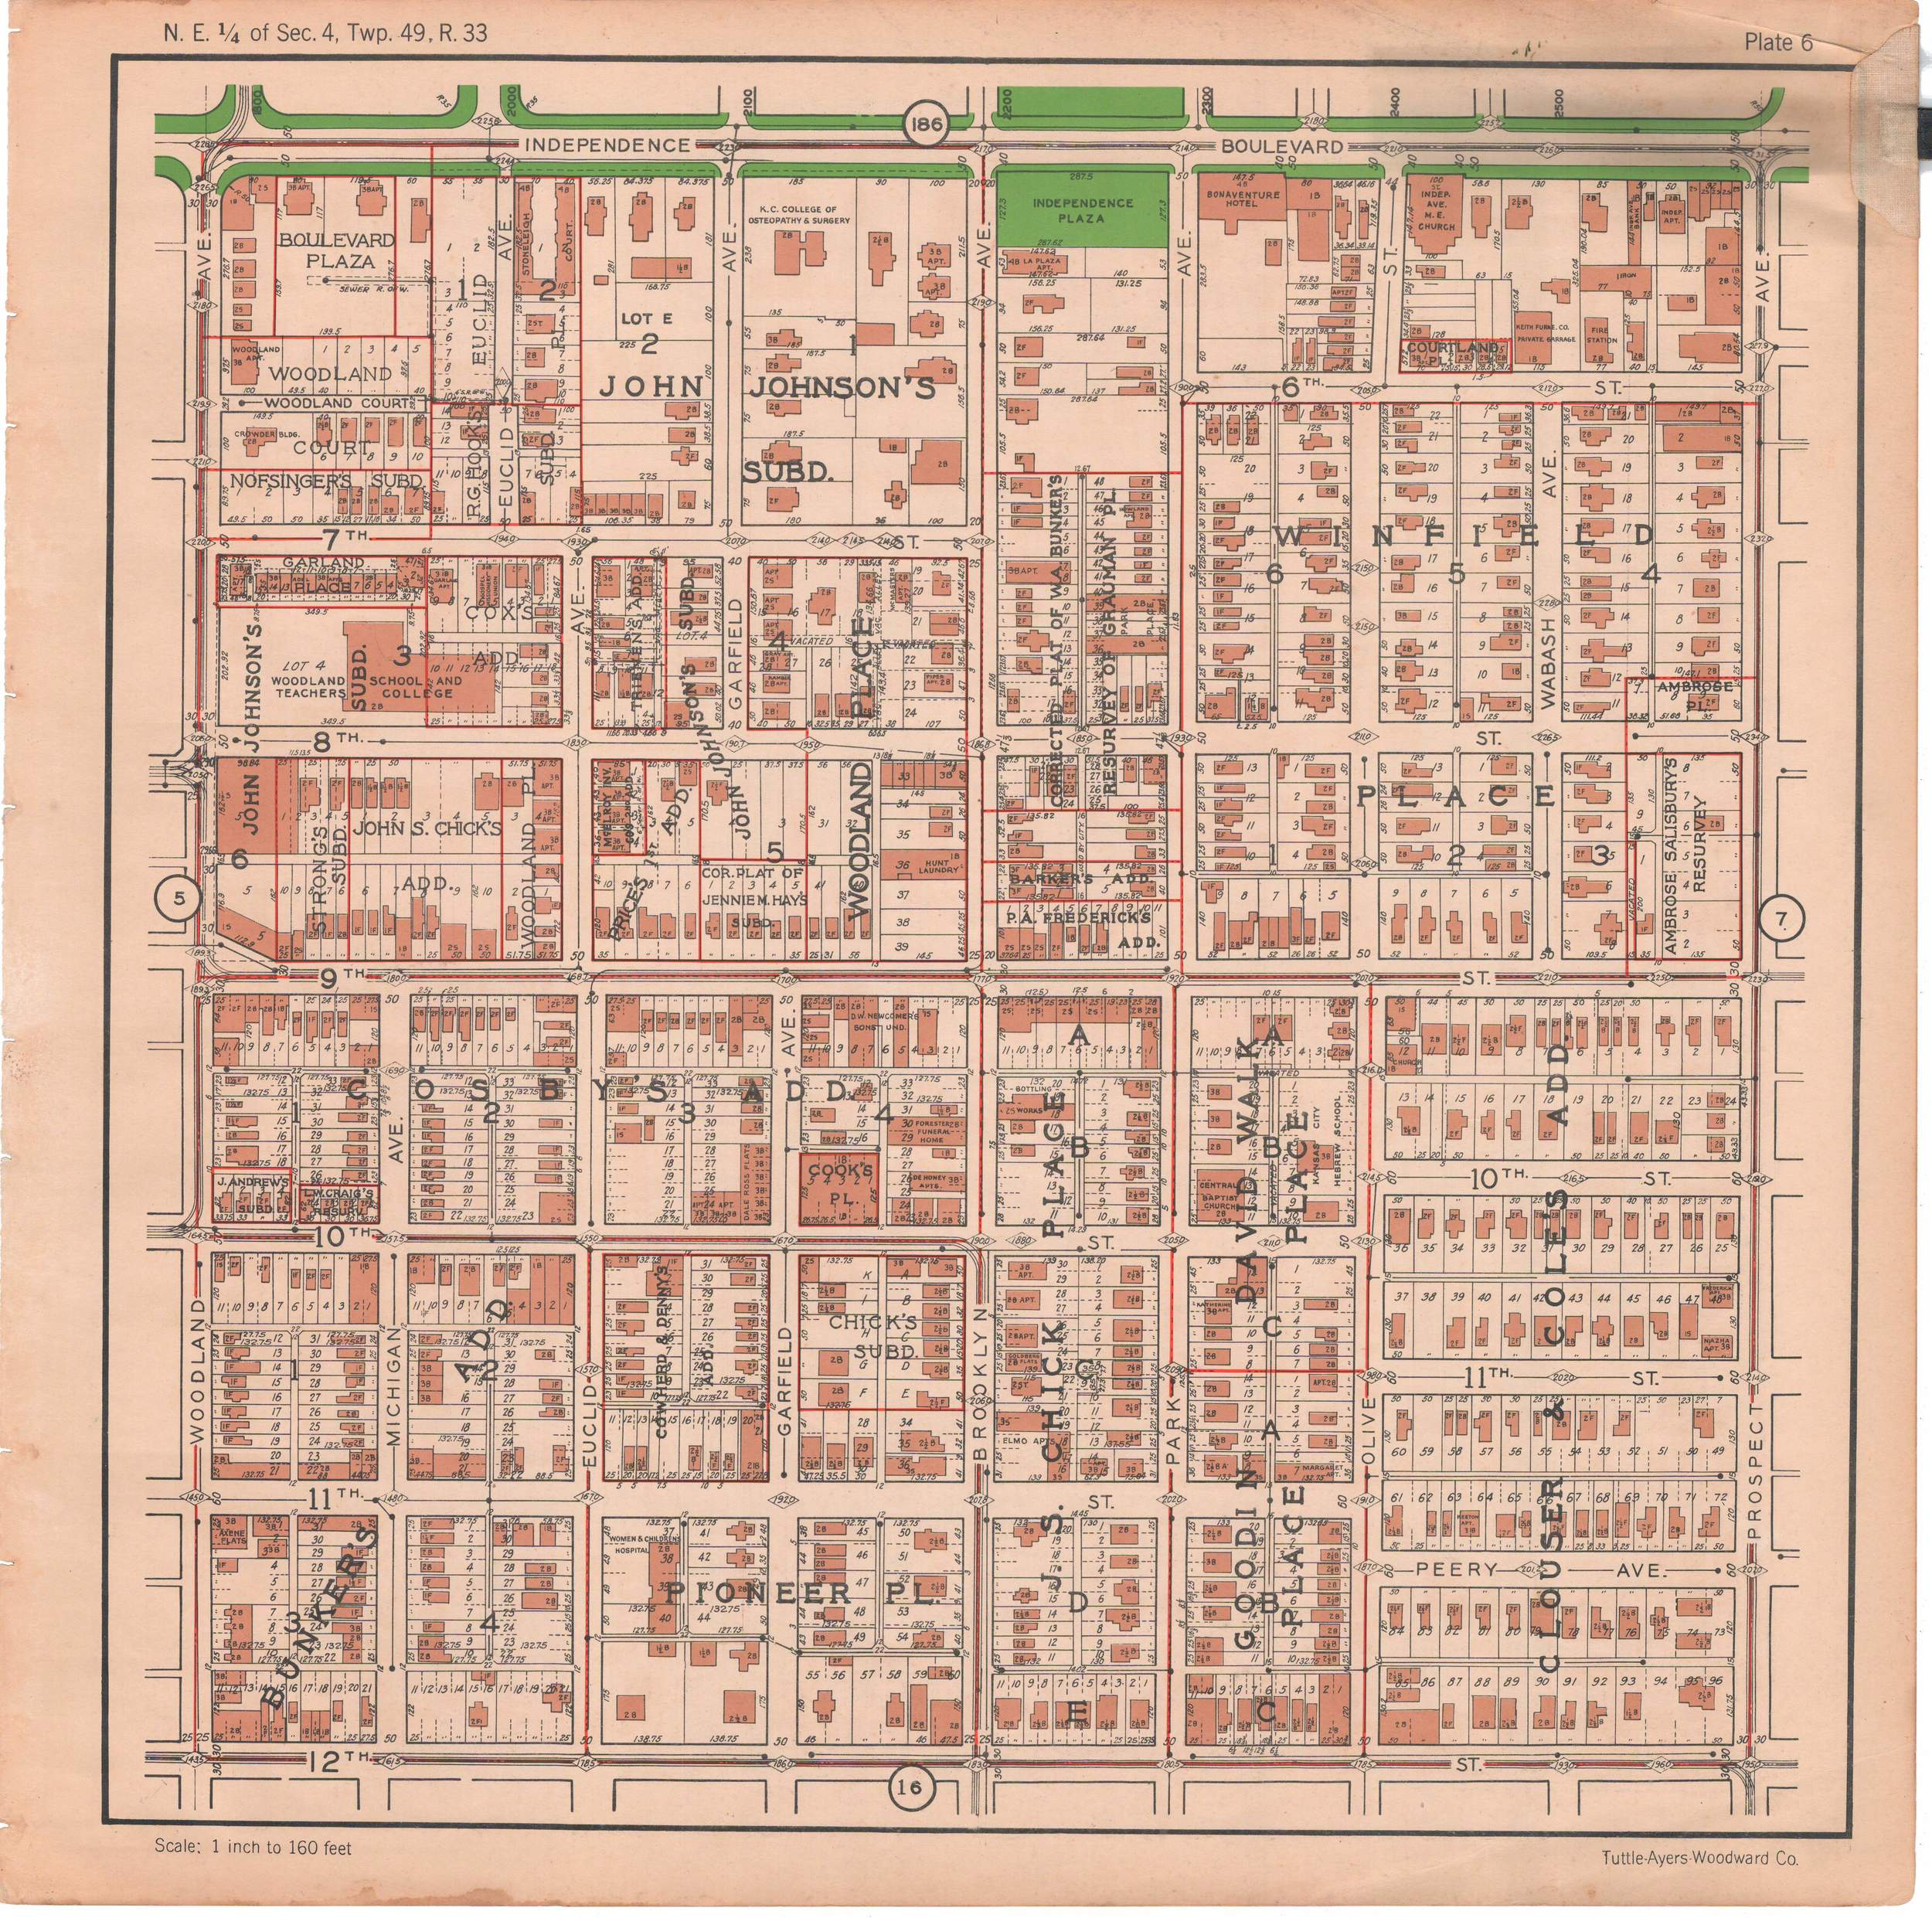 1925 TUTTLE_AYERS_Plate 6.JPG